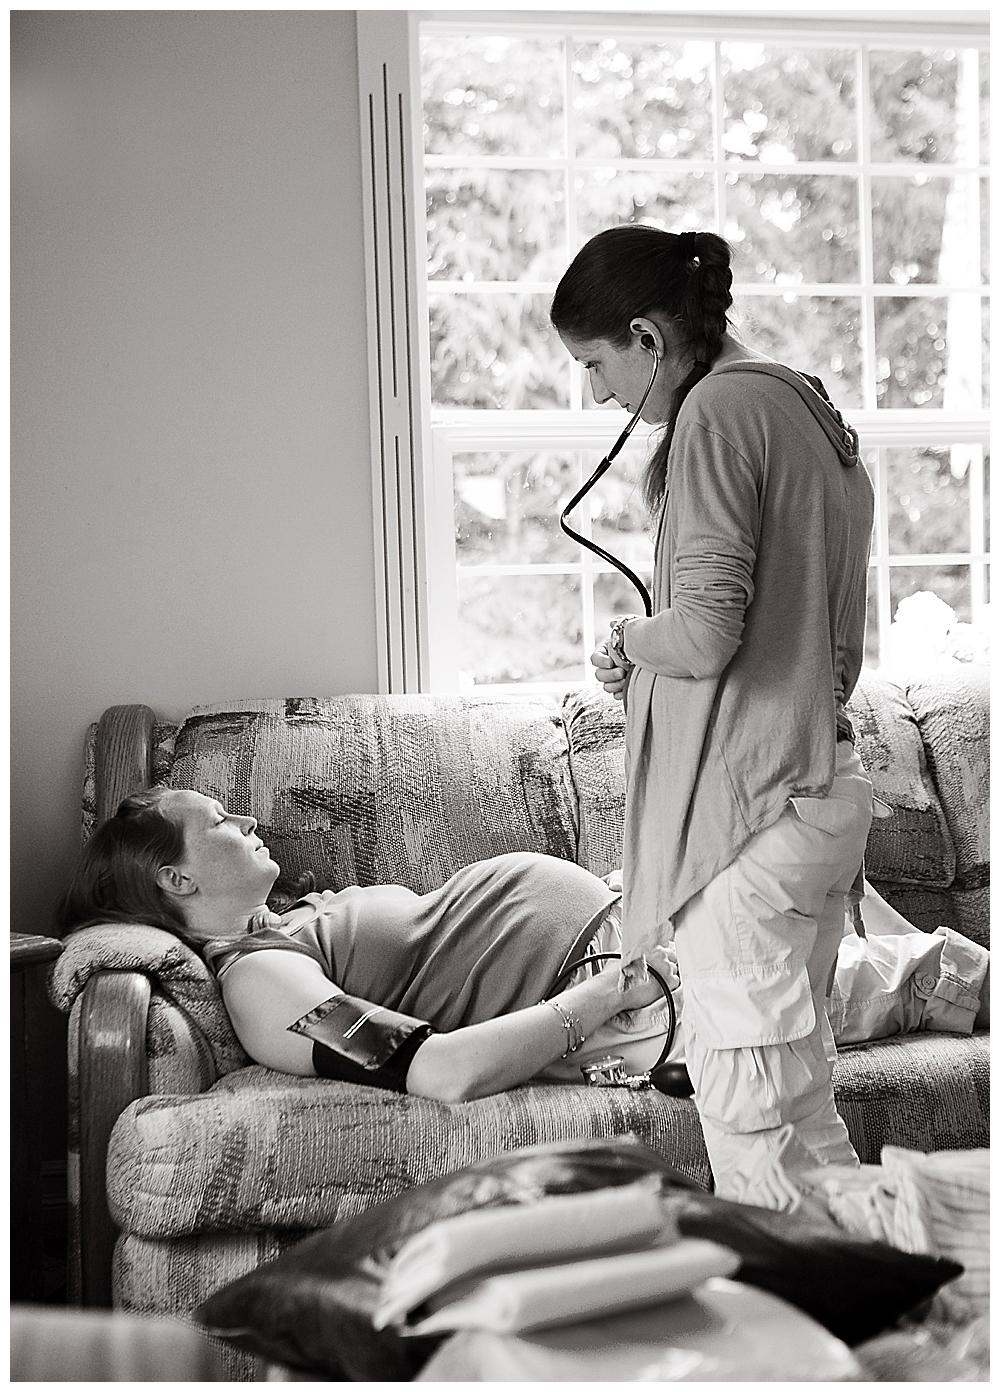 Midwife Naomi Bjorgan examines mom during early labor.